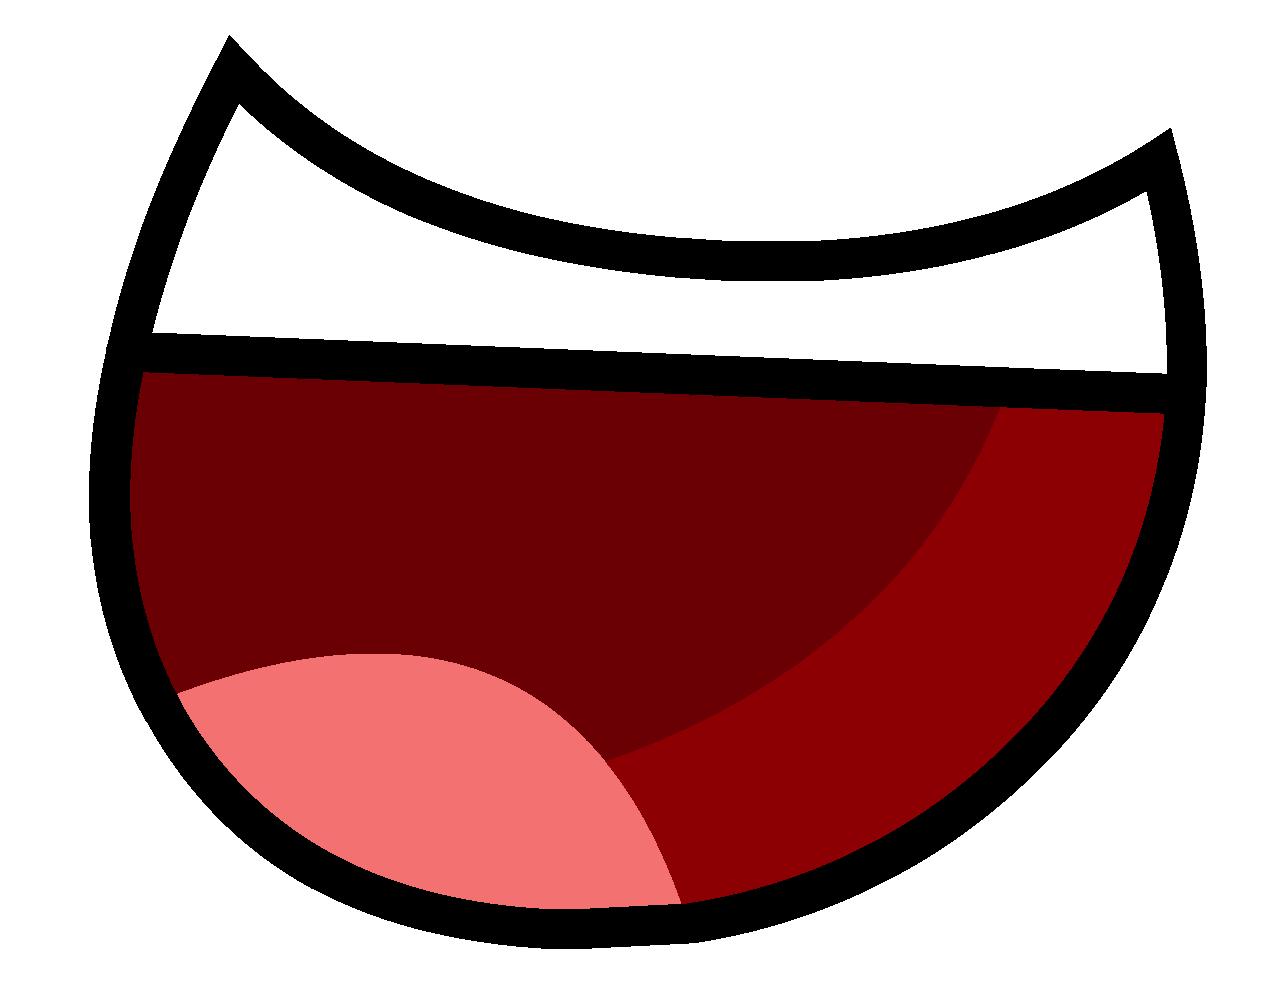 vector royalty free library Clams clipart open no background no logos